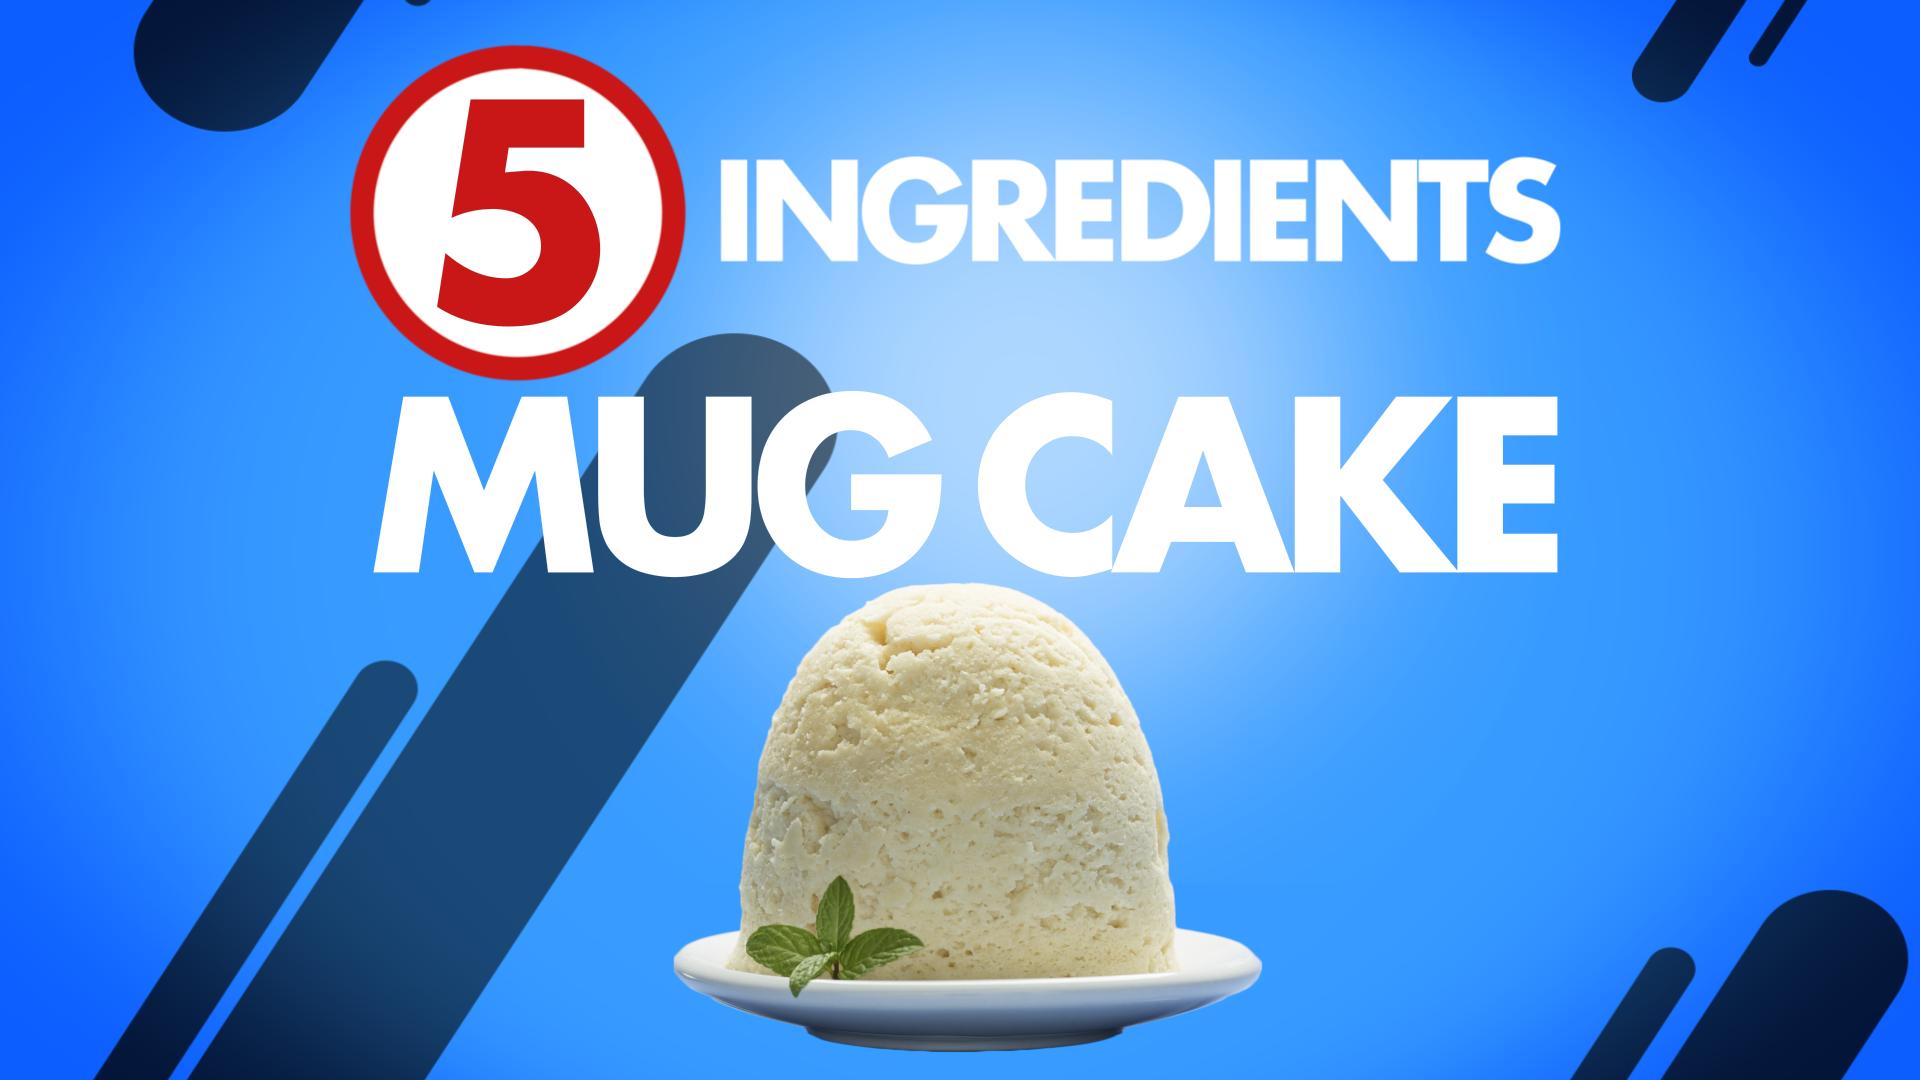 Quest Nutrition Five-Ingredient Mugcake